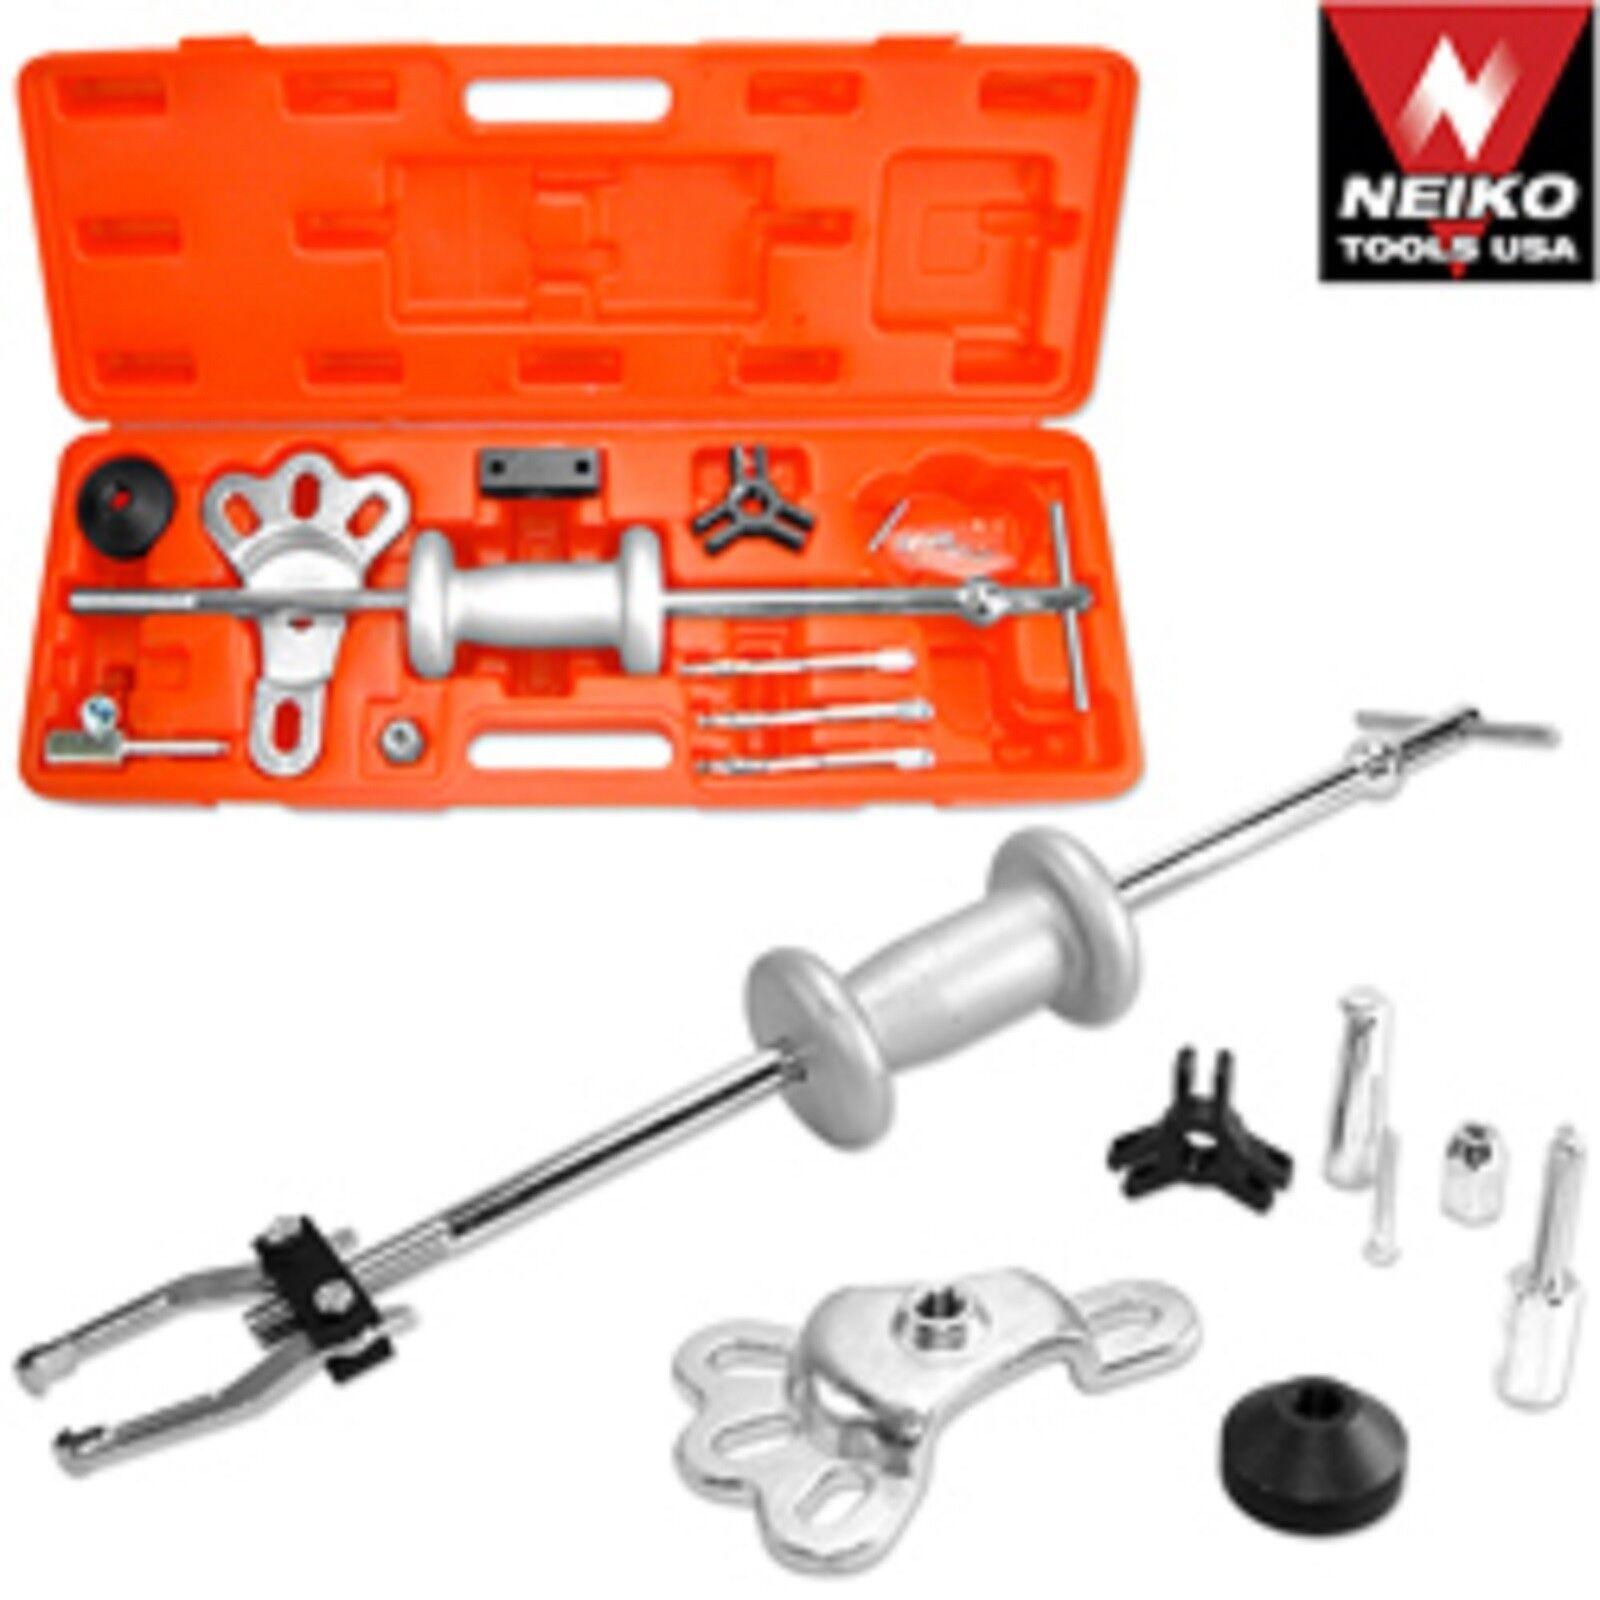 Slide Hammer/ Puller Set  W/Case   NEW